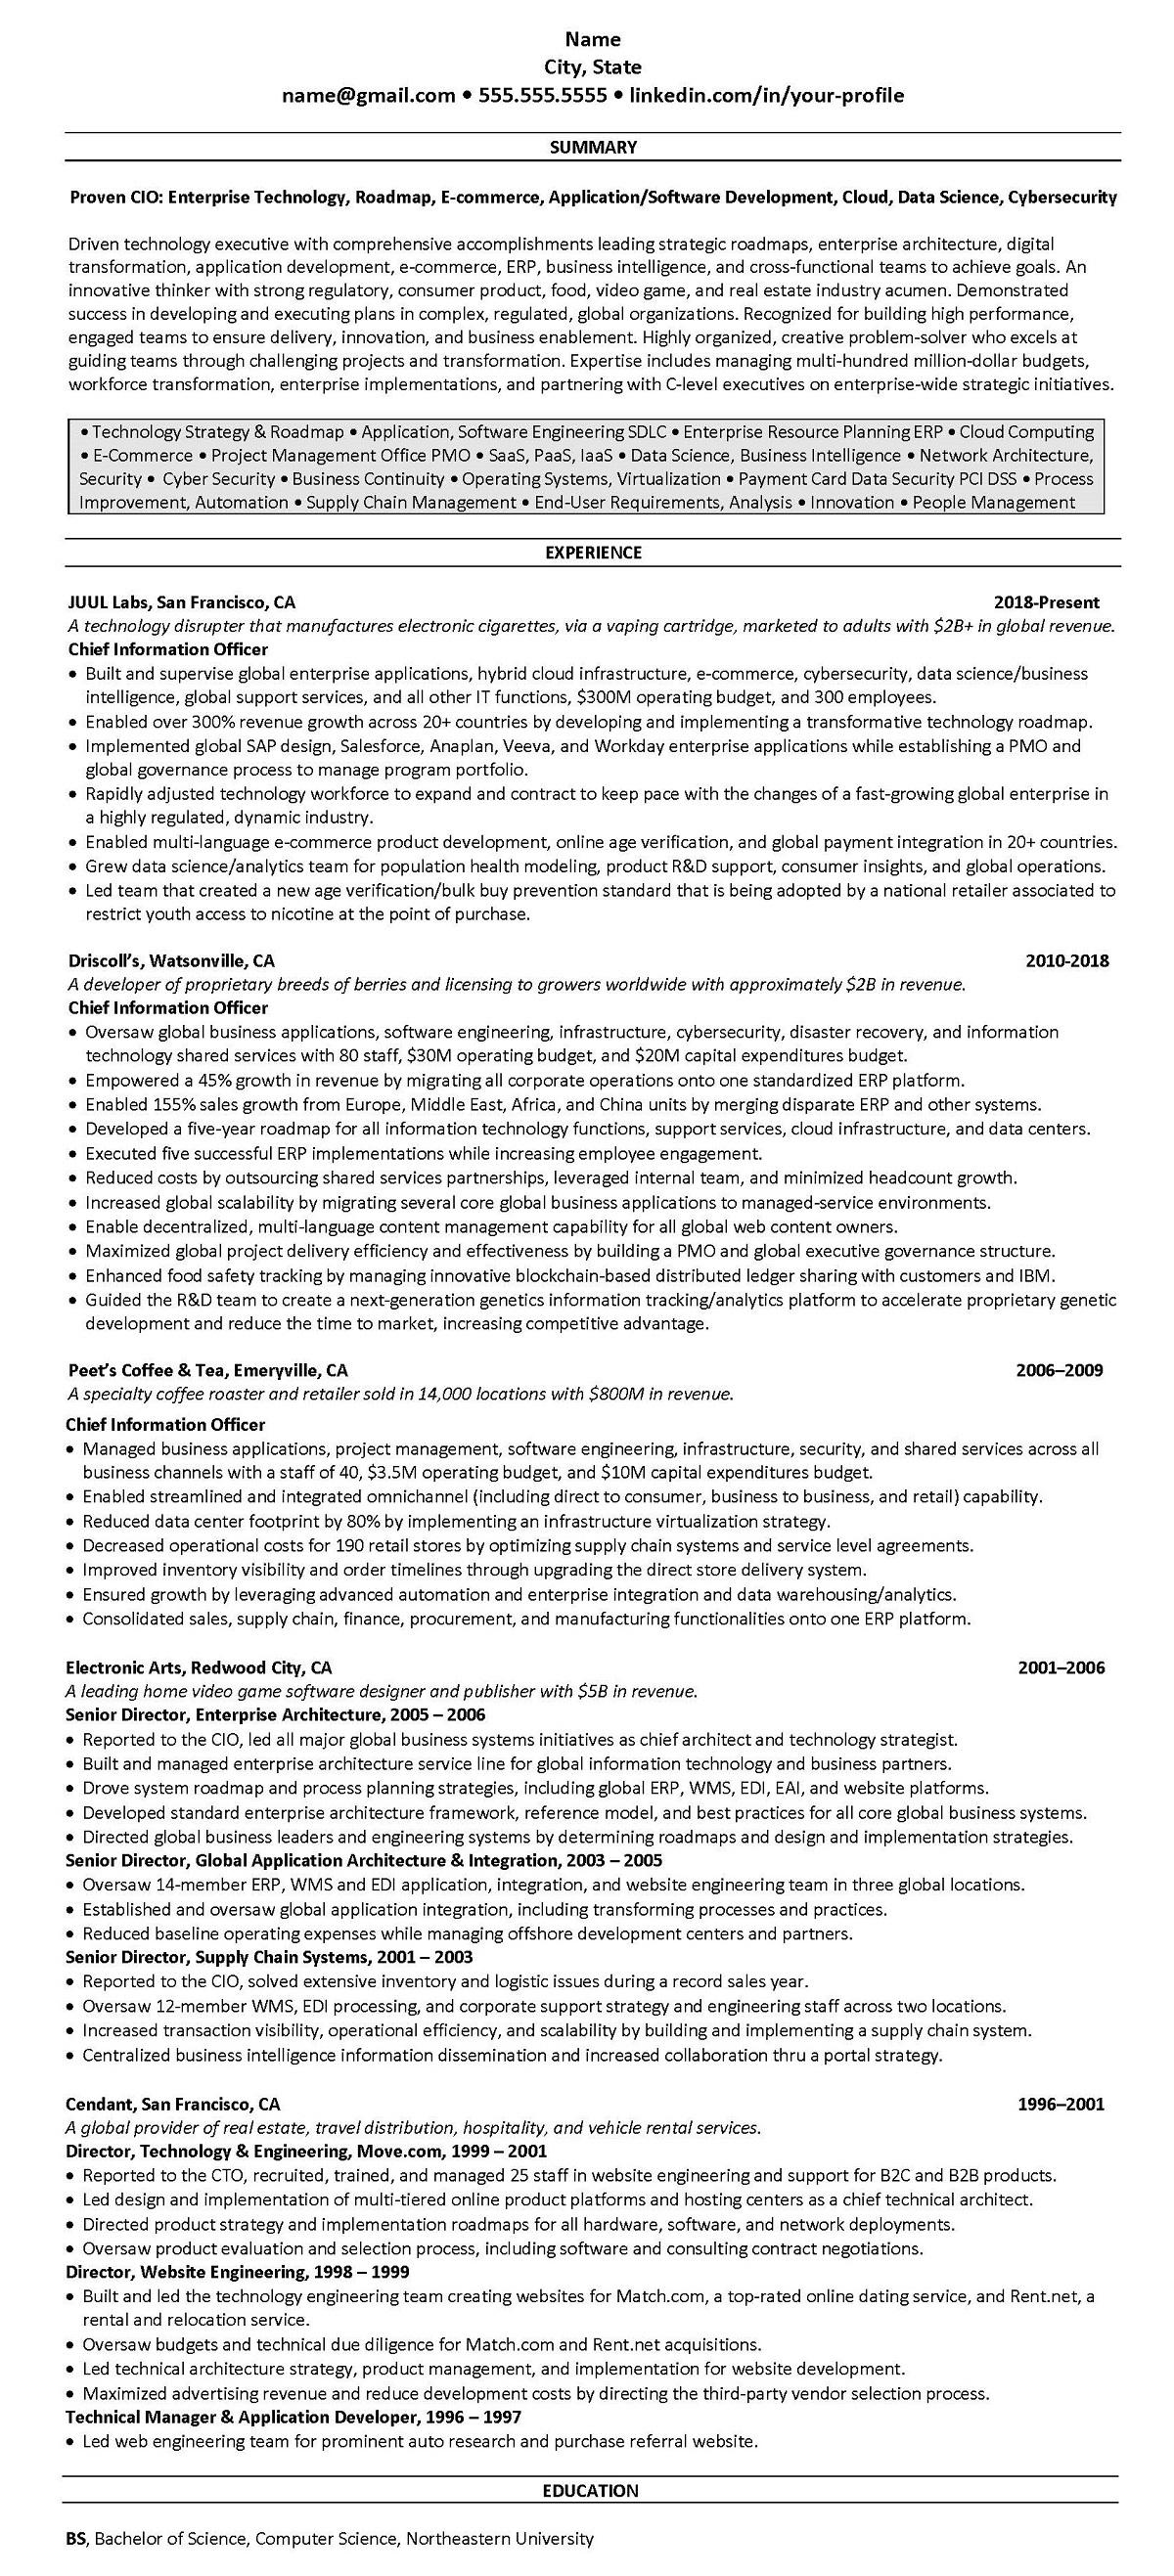 Resume 2002